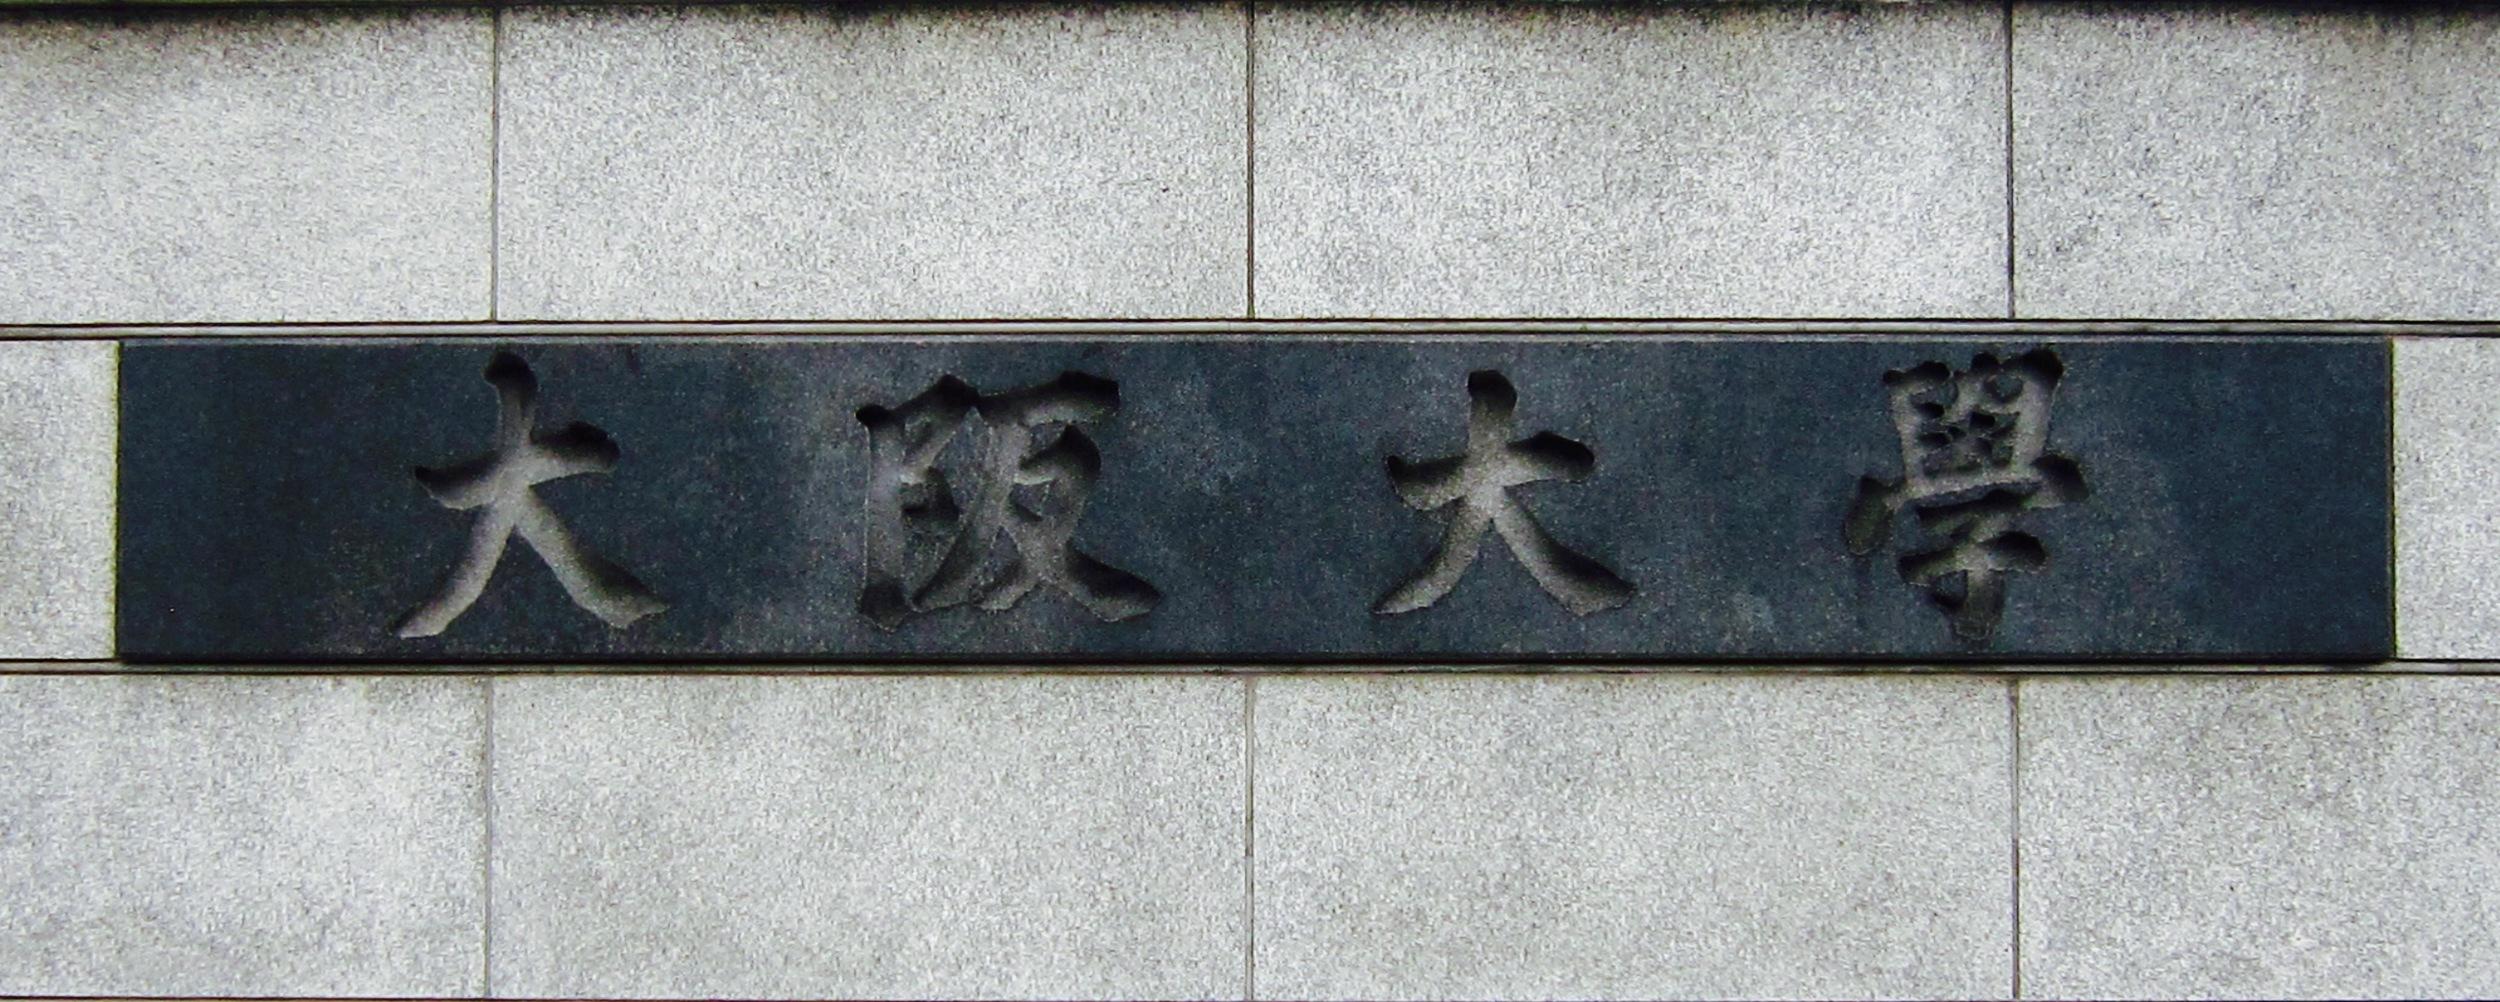 Main entrance Ōsaka University (Suita Campus)  2015  © Wolfgang Schwentker